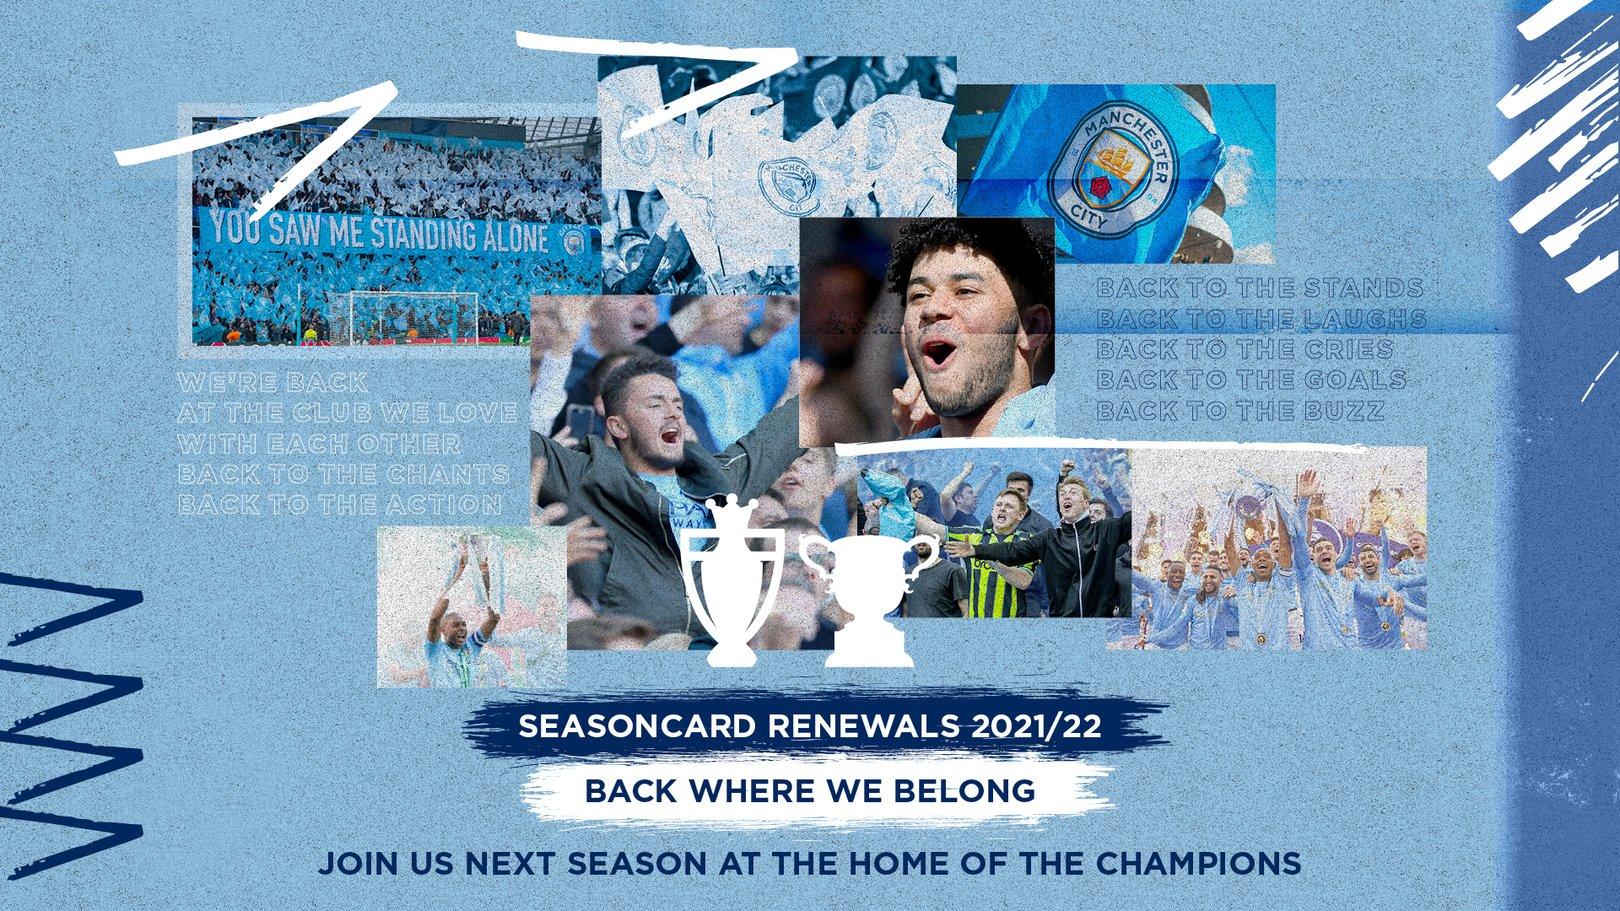 2021/22 Seasoncard renewals now open